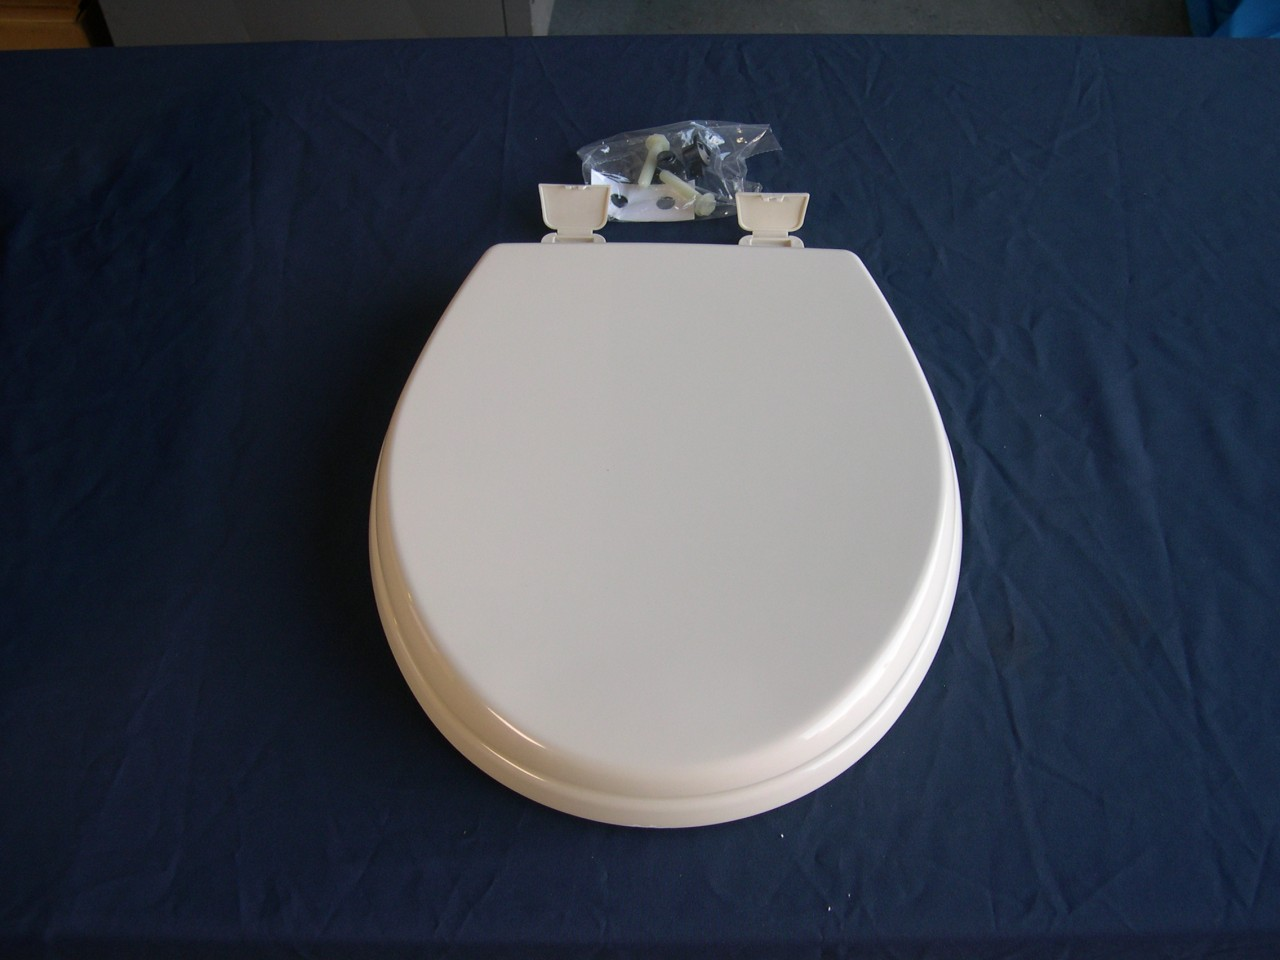 Sealand Dometic 385343829 Marine Toilet Seat Amp Lid